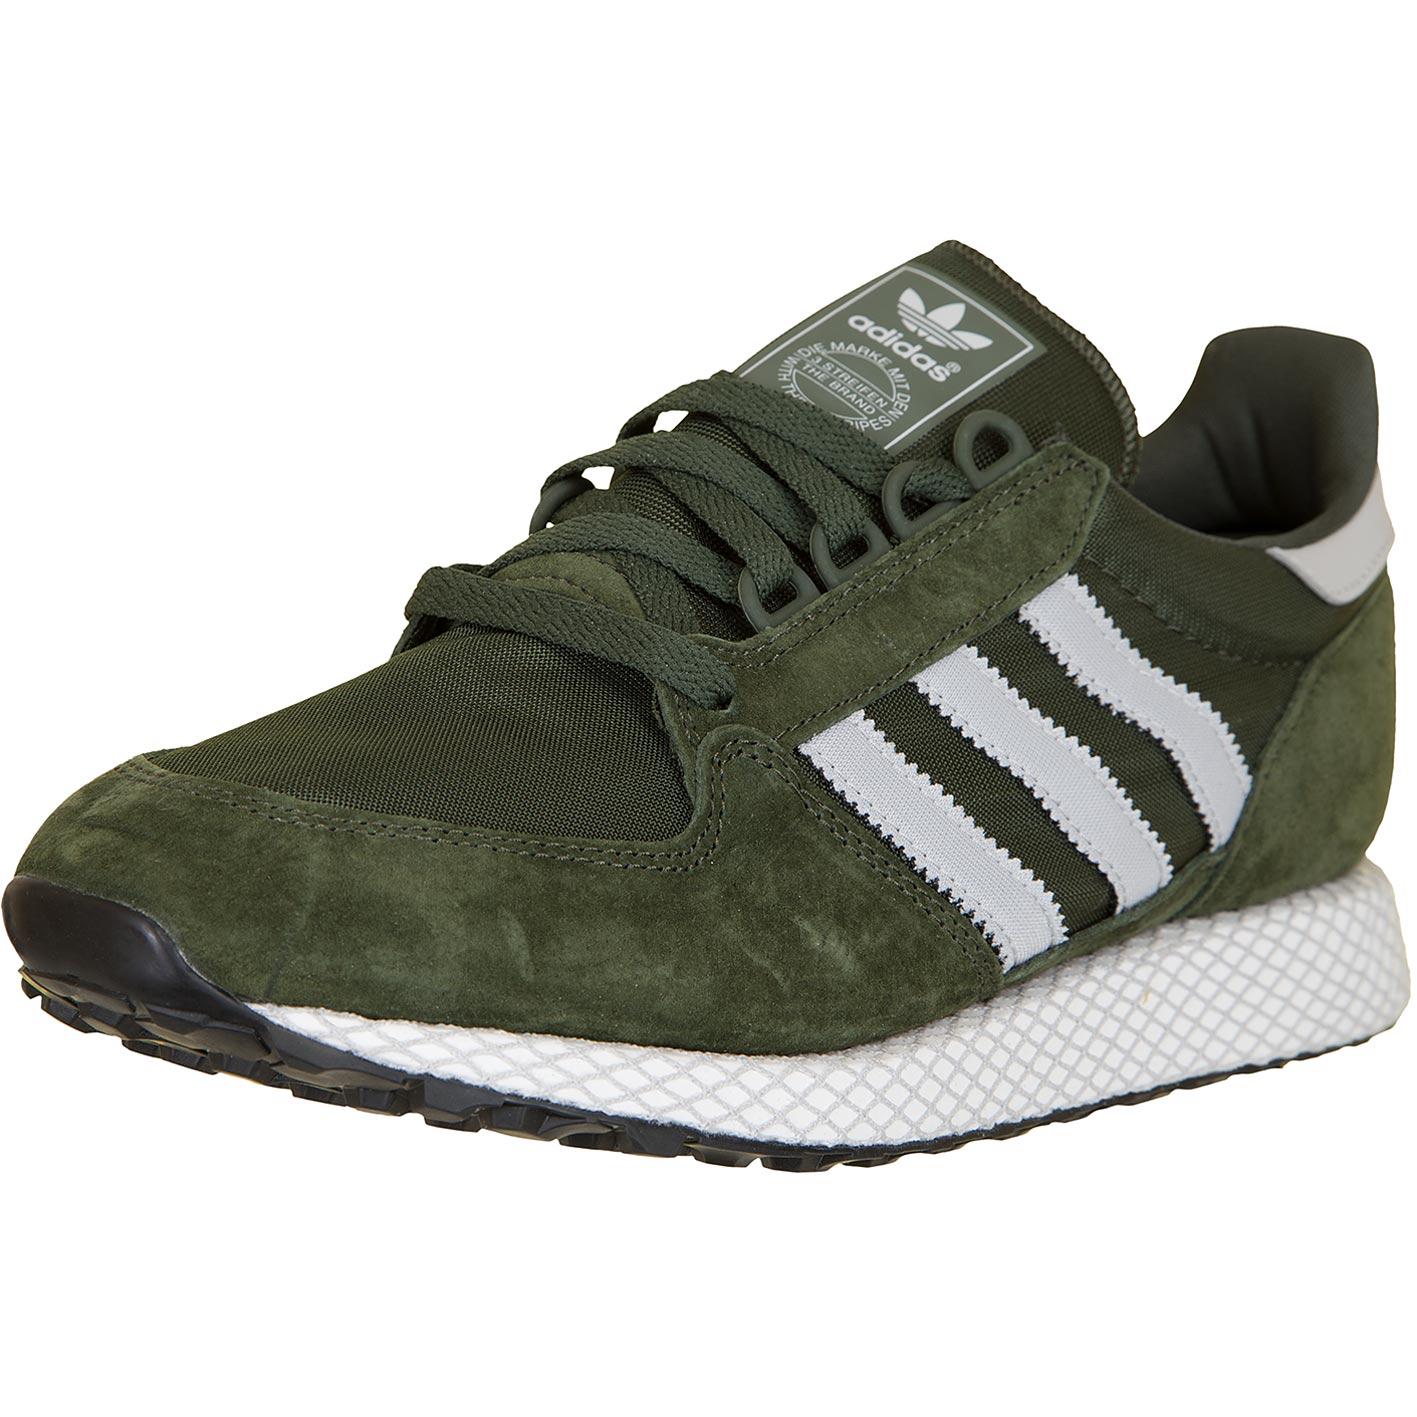 ☆ Adidas Originals Sneaker Forest Grove olivgrau hier